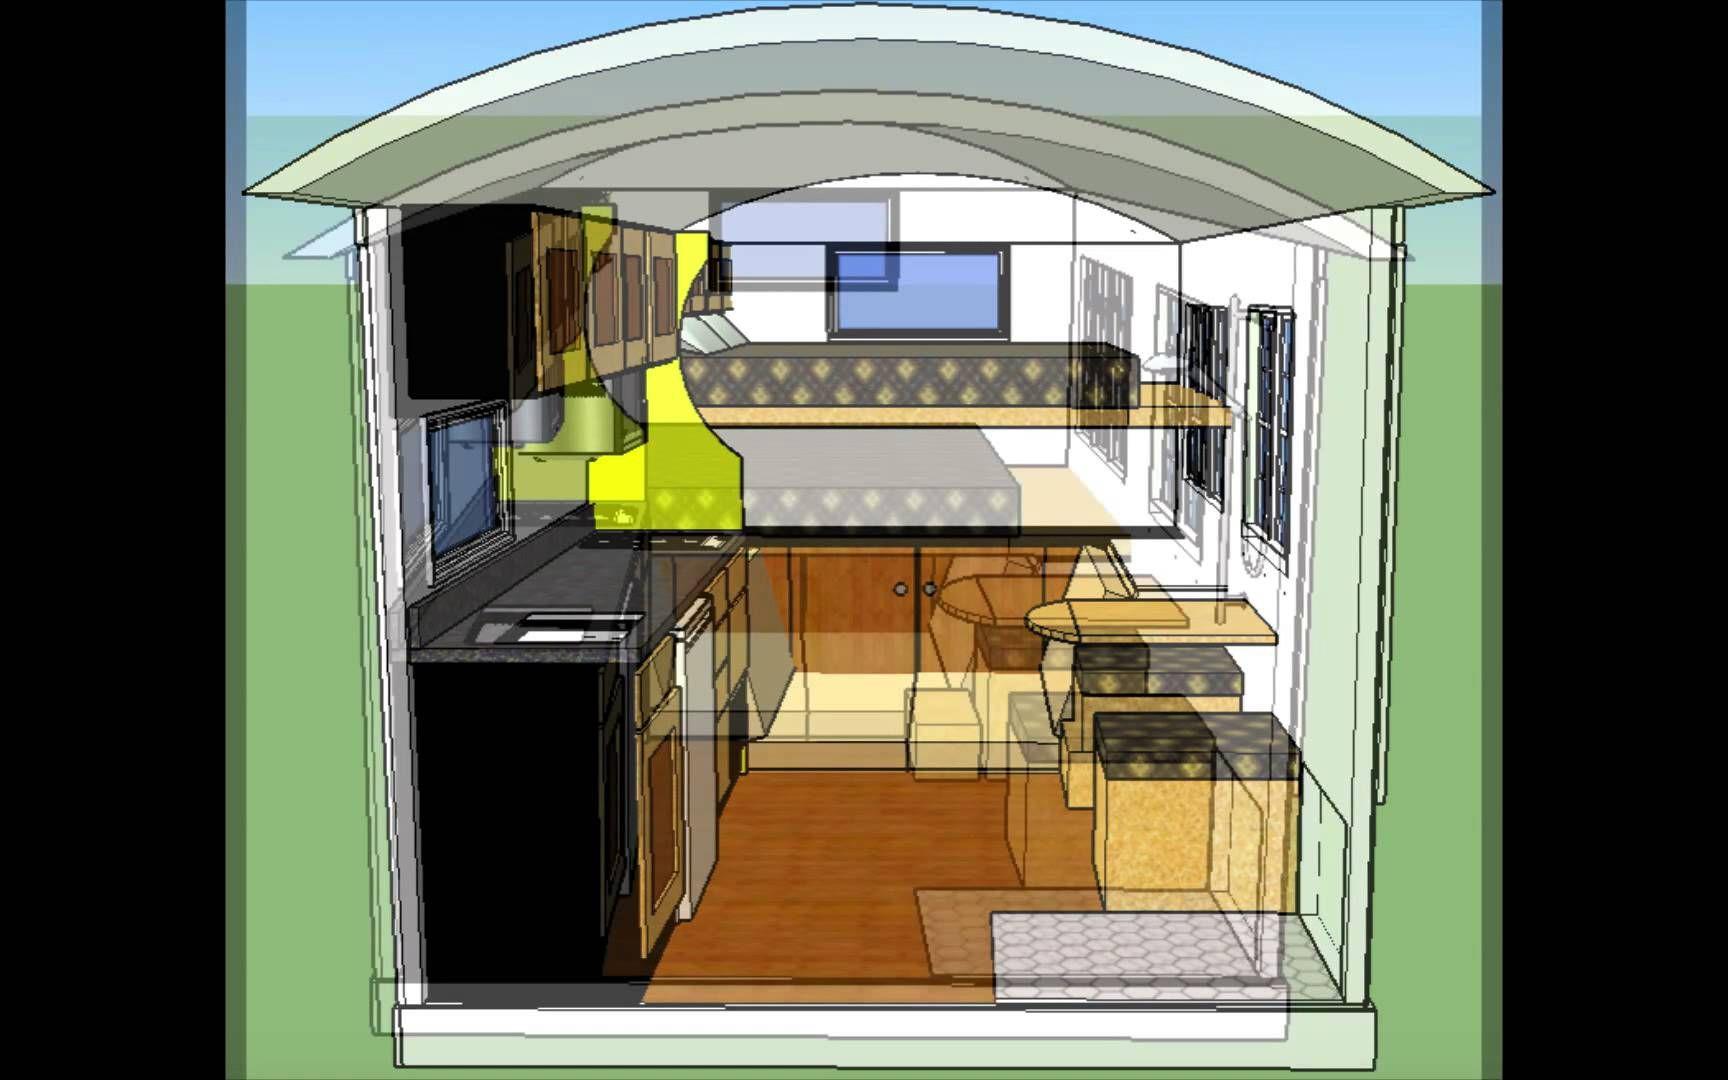 Tiny House Floor Plans Trailer 8x12 tiny house 2 hd 1080p. this tiny house can be built on a